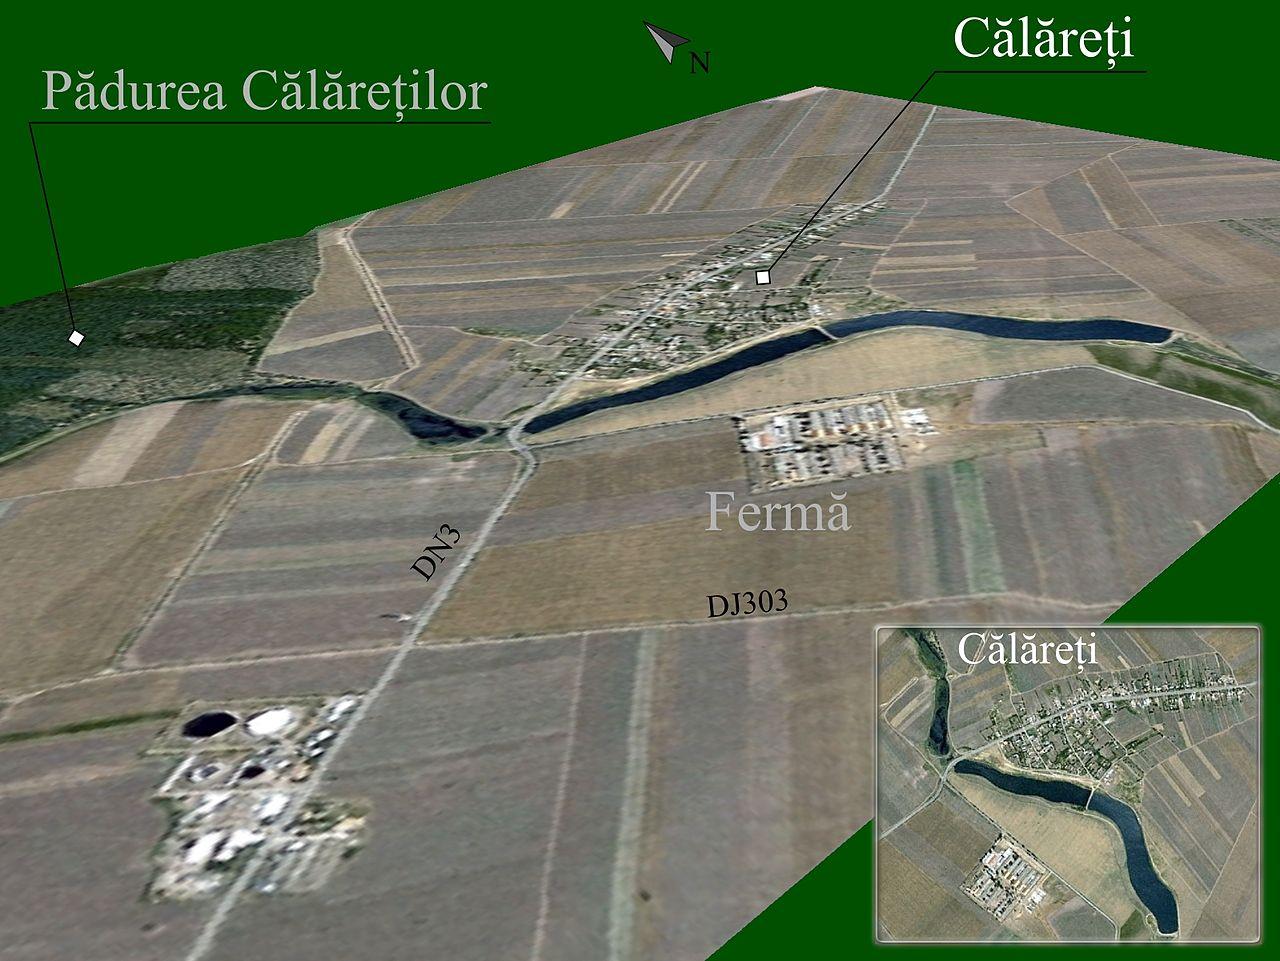 File:Calarasi in Romania.svg - Wikipedia